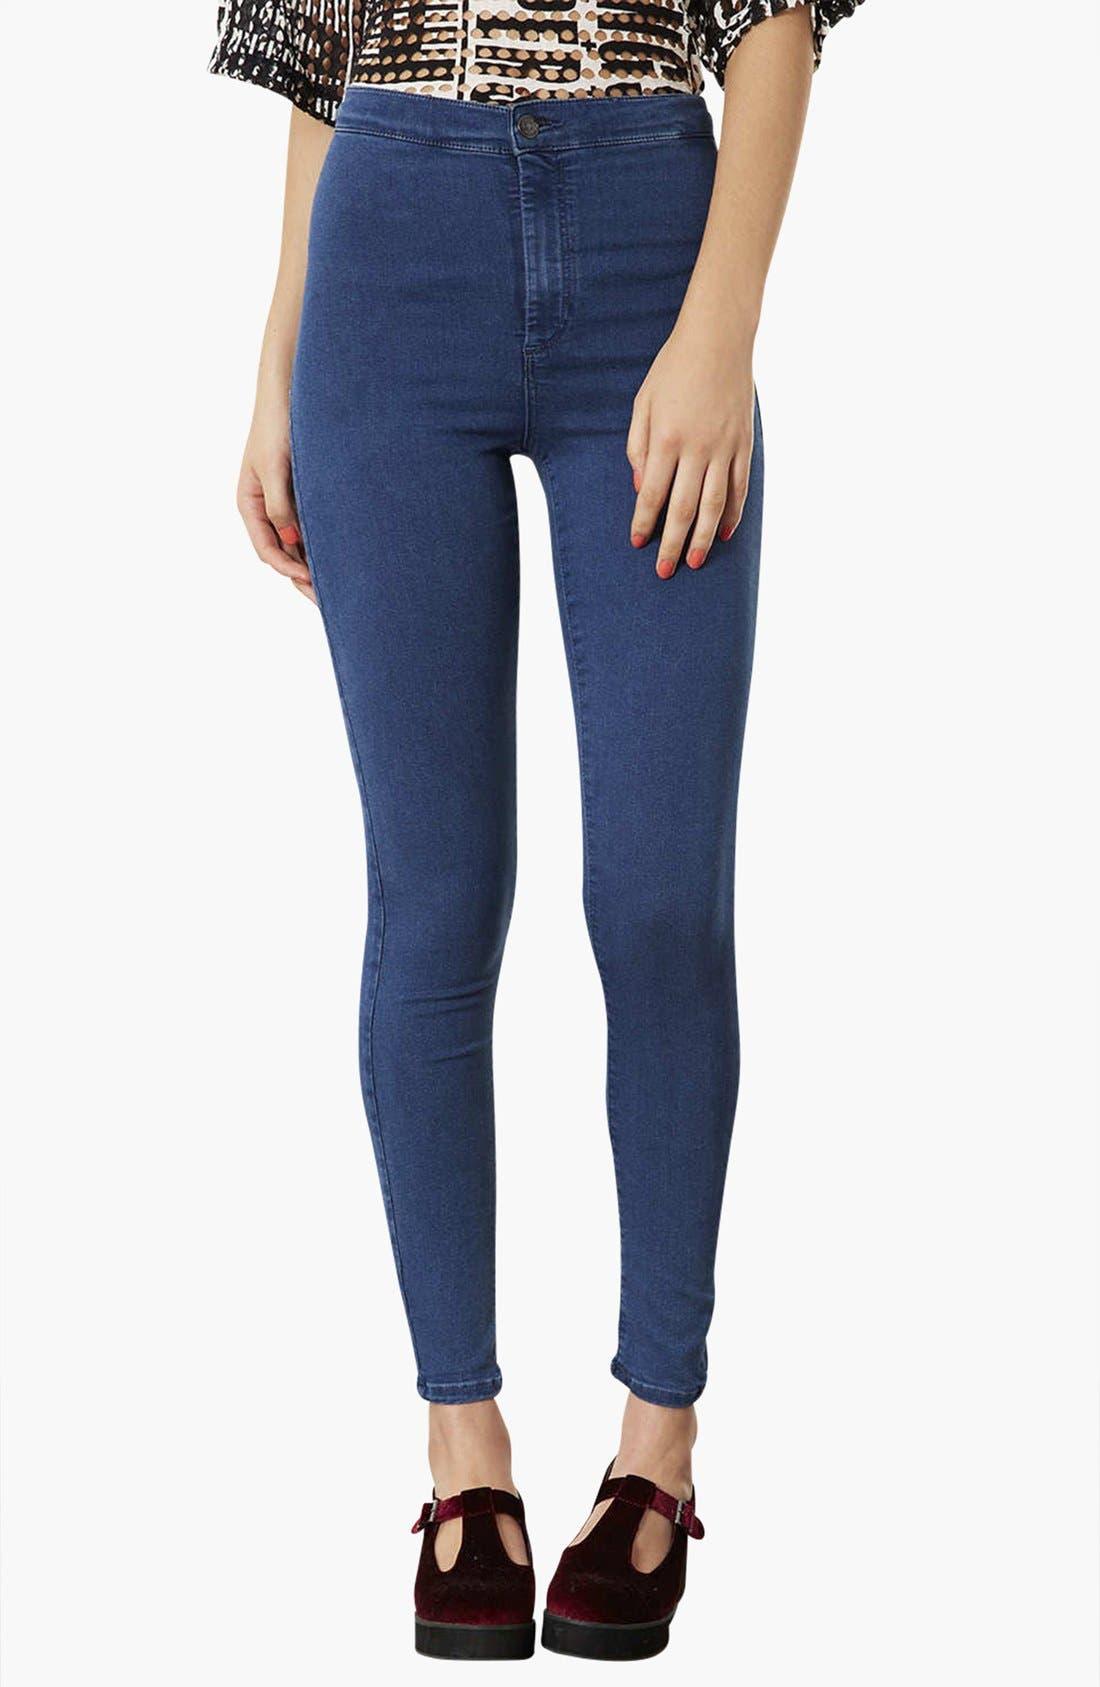 Alternate Image 1 Selected - Topshop Moto 'Joni' High Rise Skinny Jeans (Dark Stone) (Regular, Short & Long)